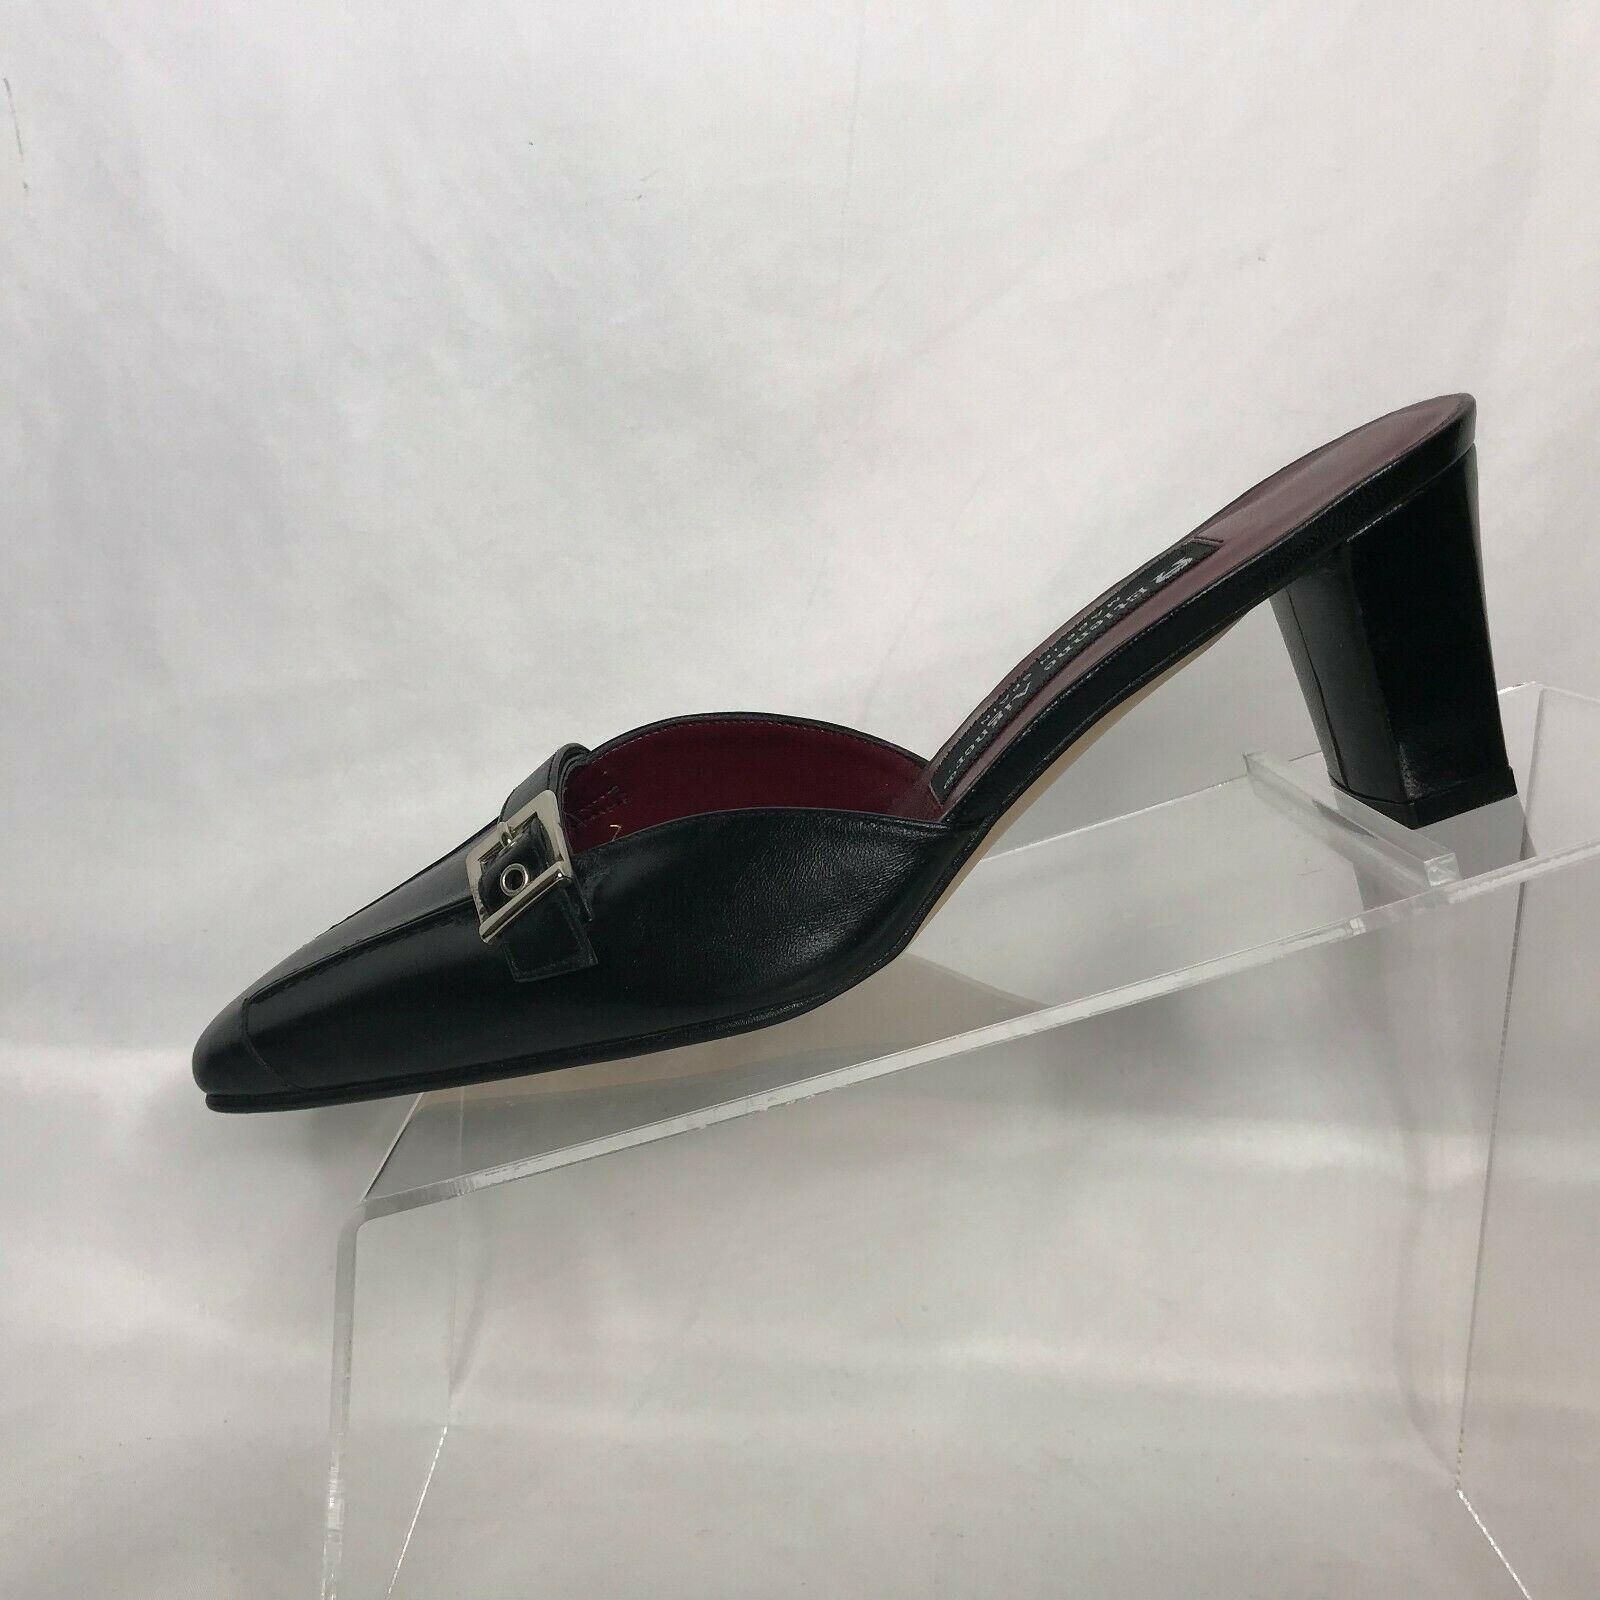 2e16cfa8da Etienne Aigner Black Leather Mules Slingbacks Heels Size 7M Spain Jade Shoes  - $29.69